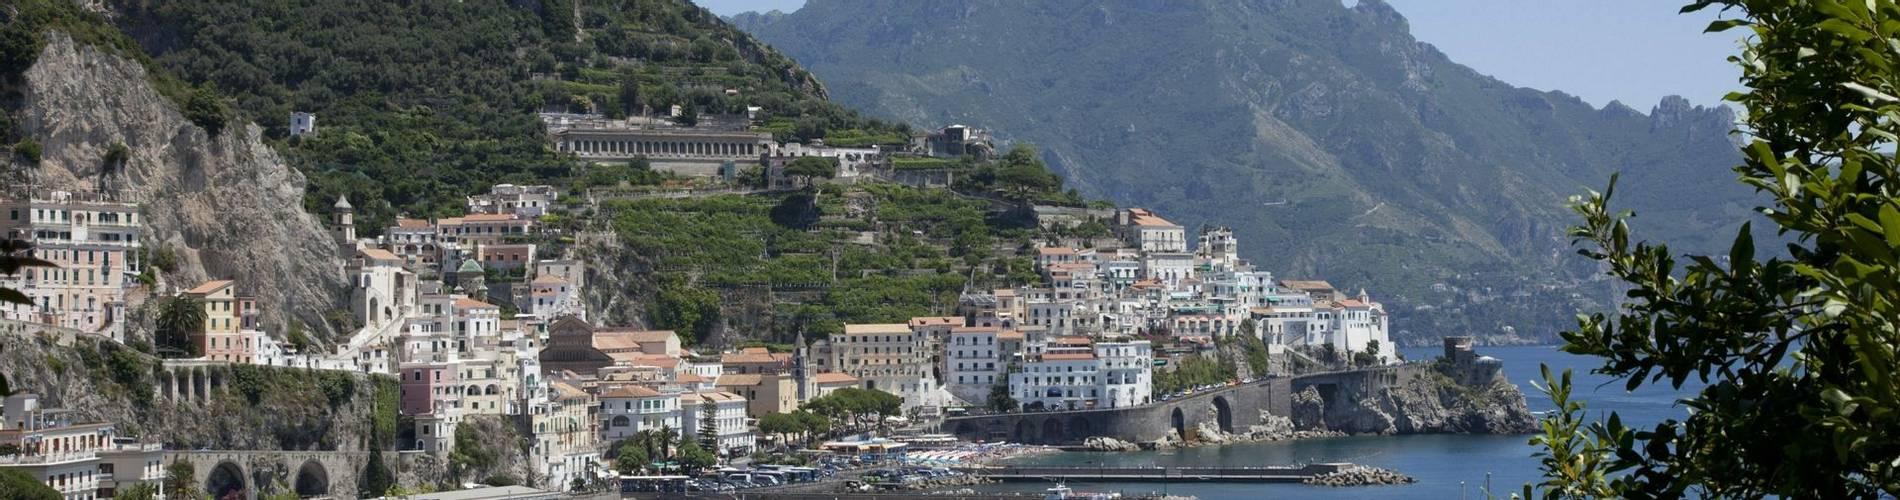 Miramalfi, Amalfi Coast, Italy (52).jpg